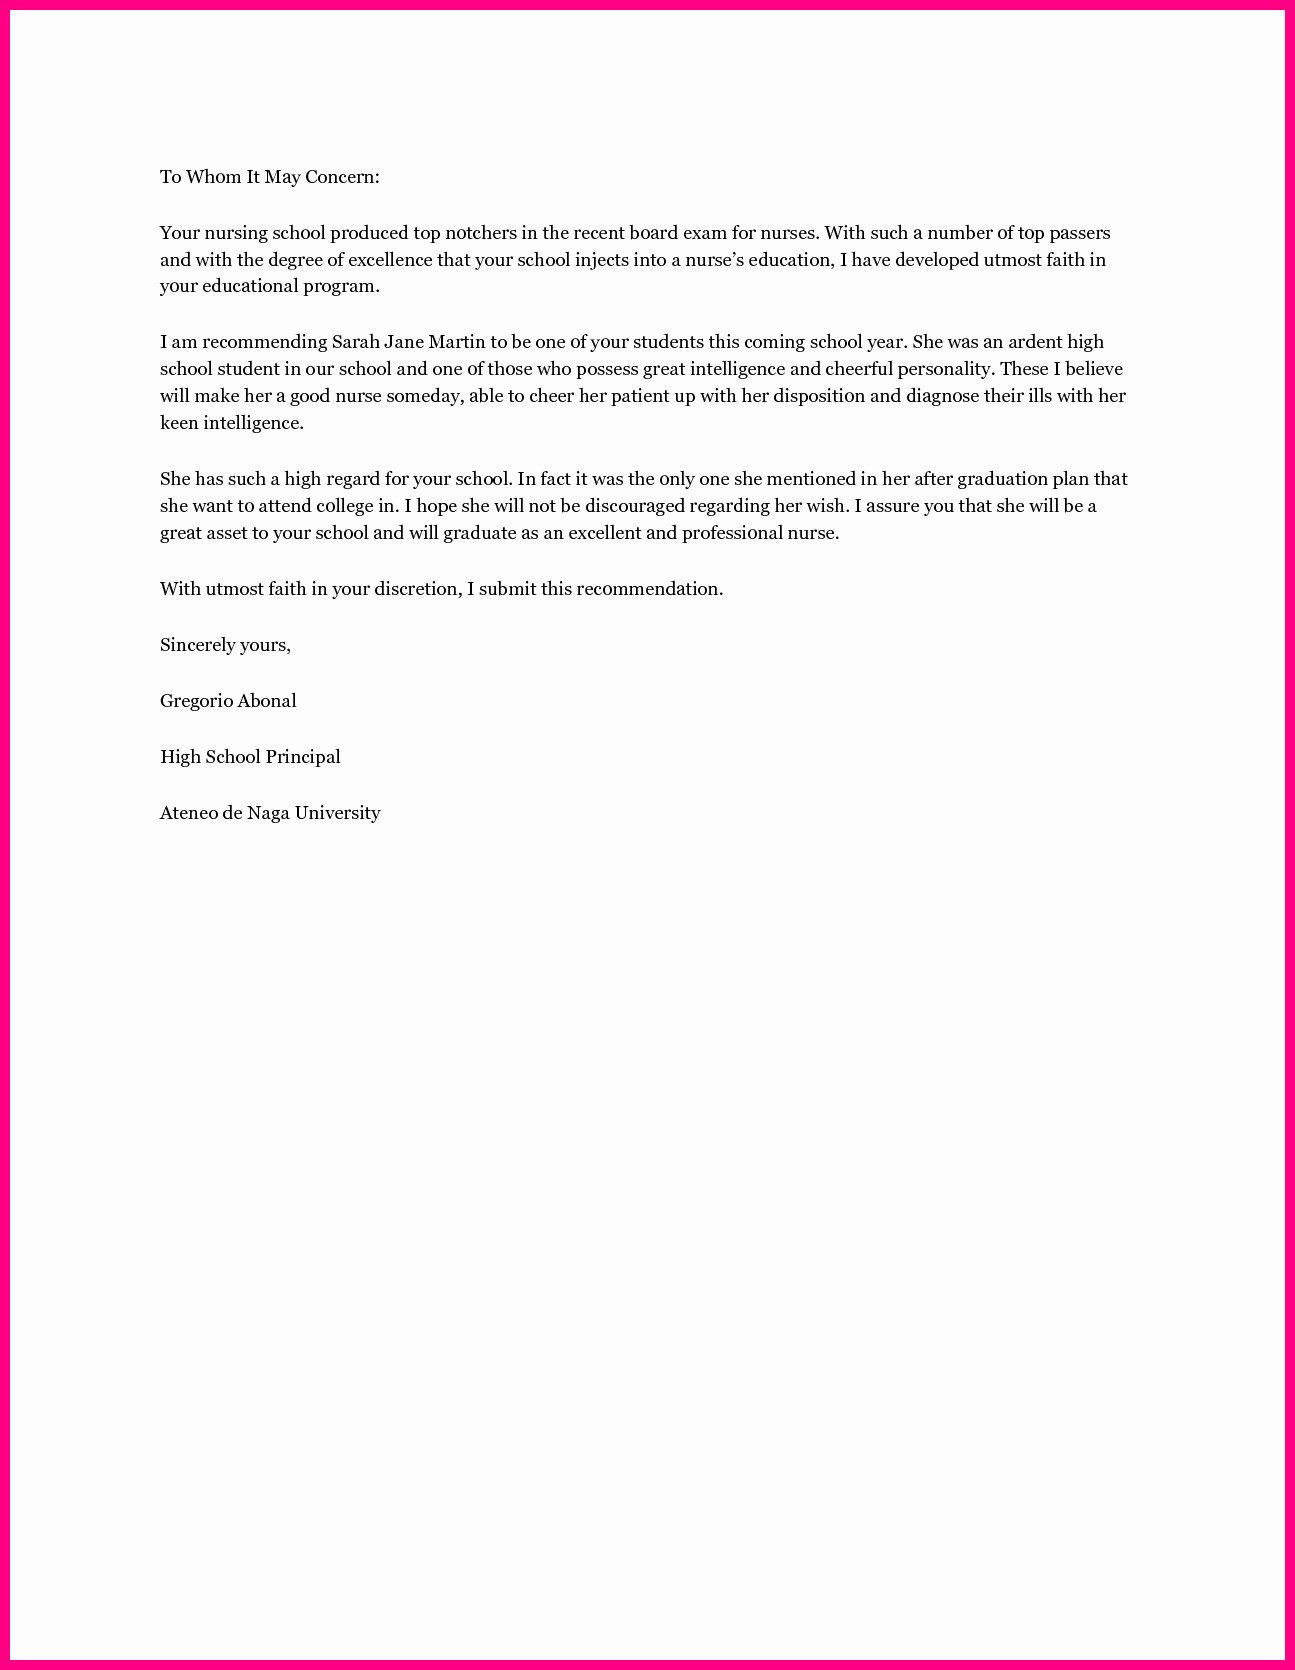 Nursing Letter Of Recommendation Example Fresh Nursing School Re Mendation Letter Template Samples